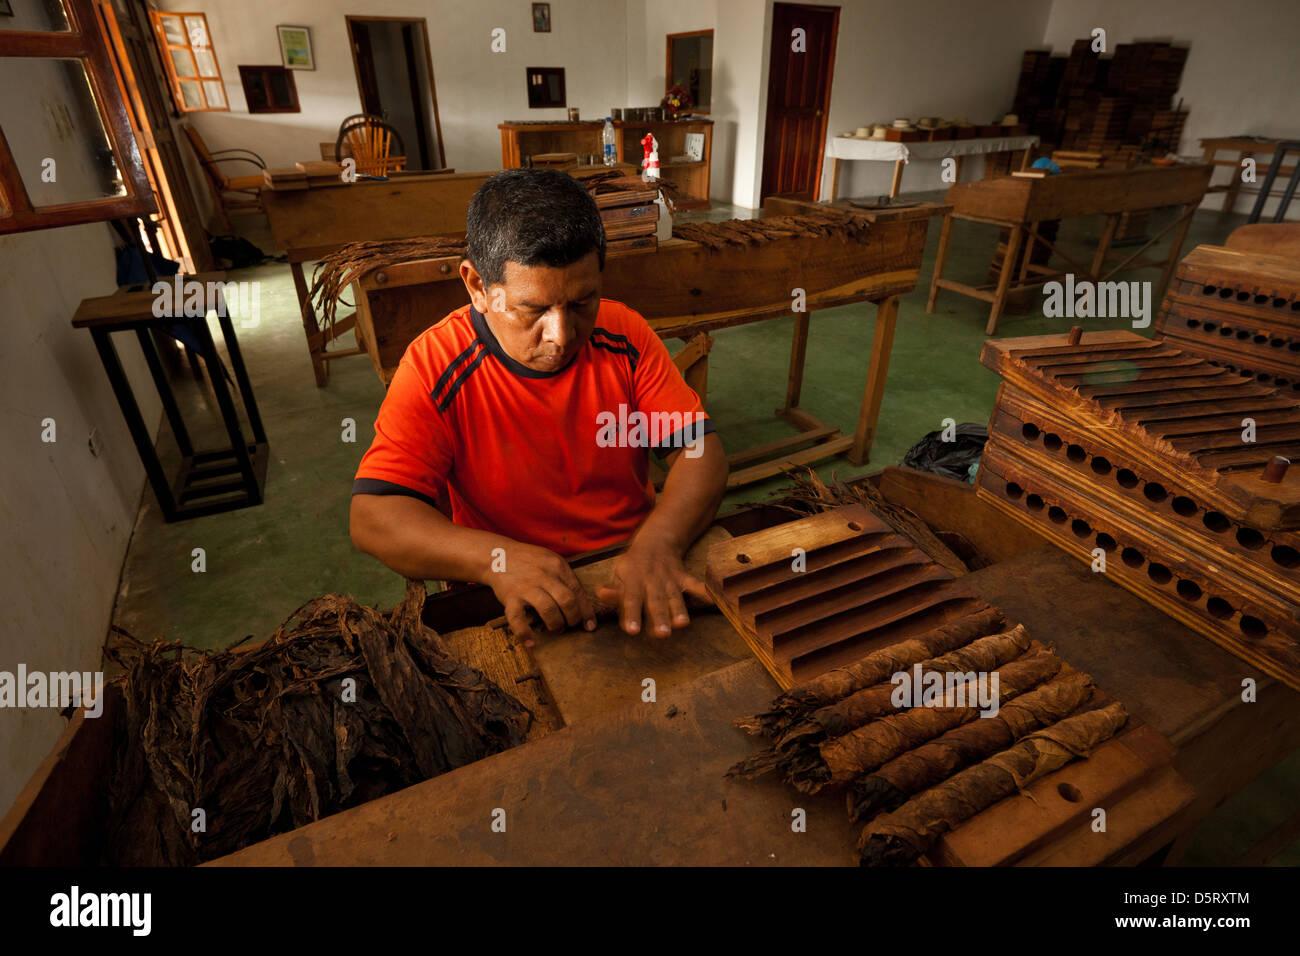 Zigarren in der Herstellung bei Joyas de Panama Zigarrenfabrik, La Pintada Dorf, Cocle Provinz, Republik von Panama. Stockbild